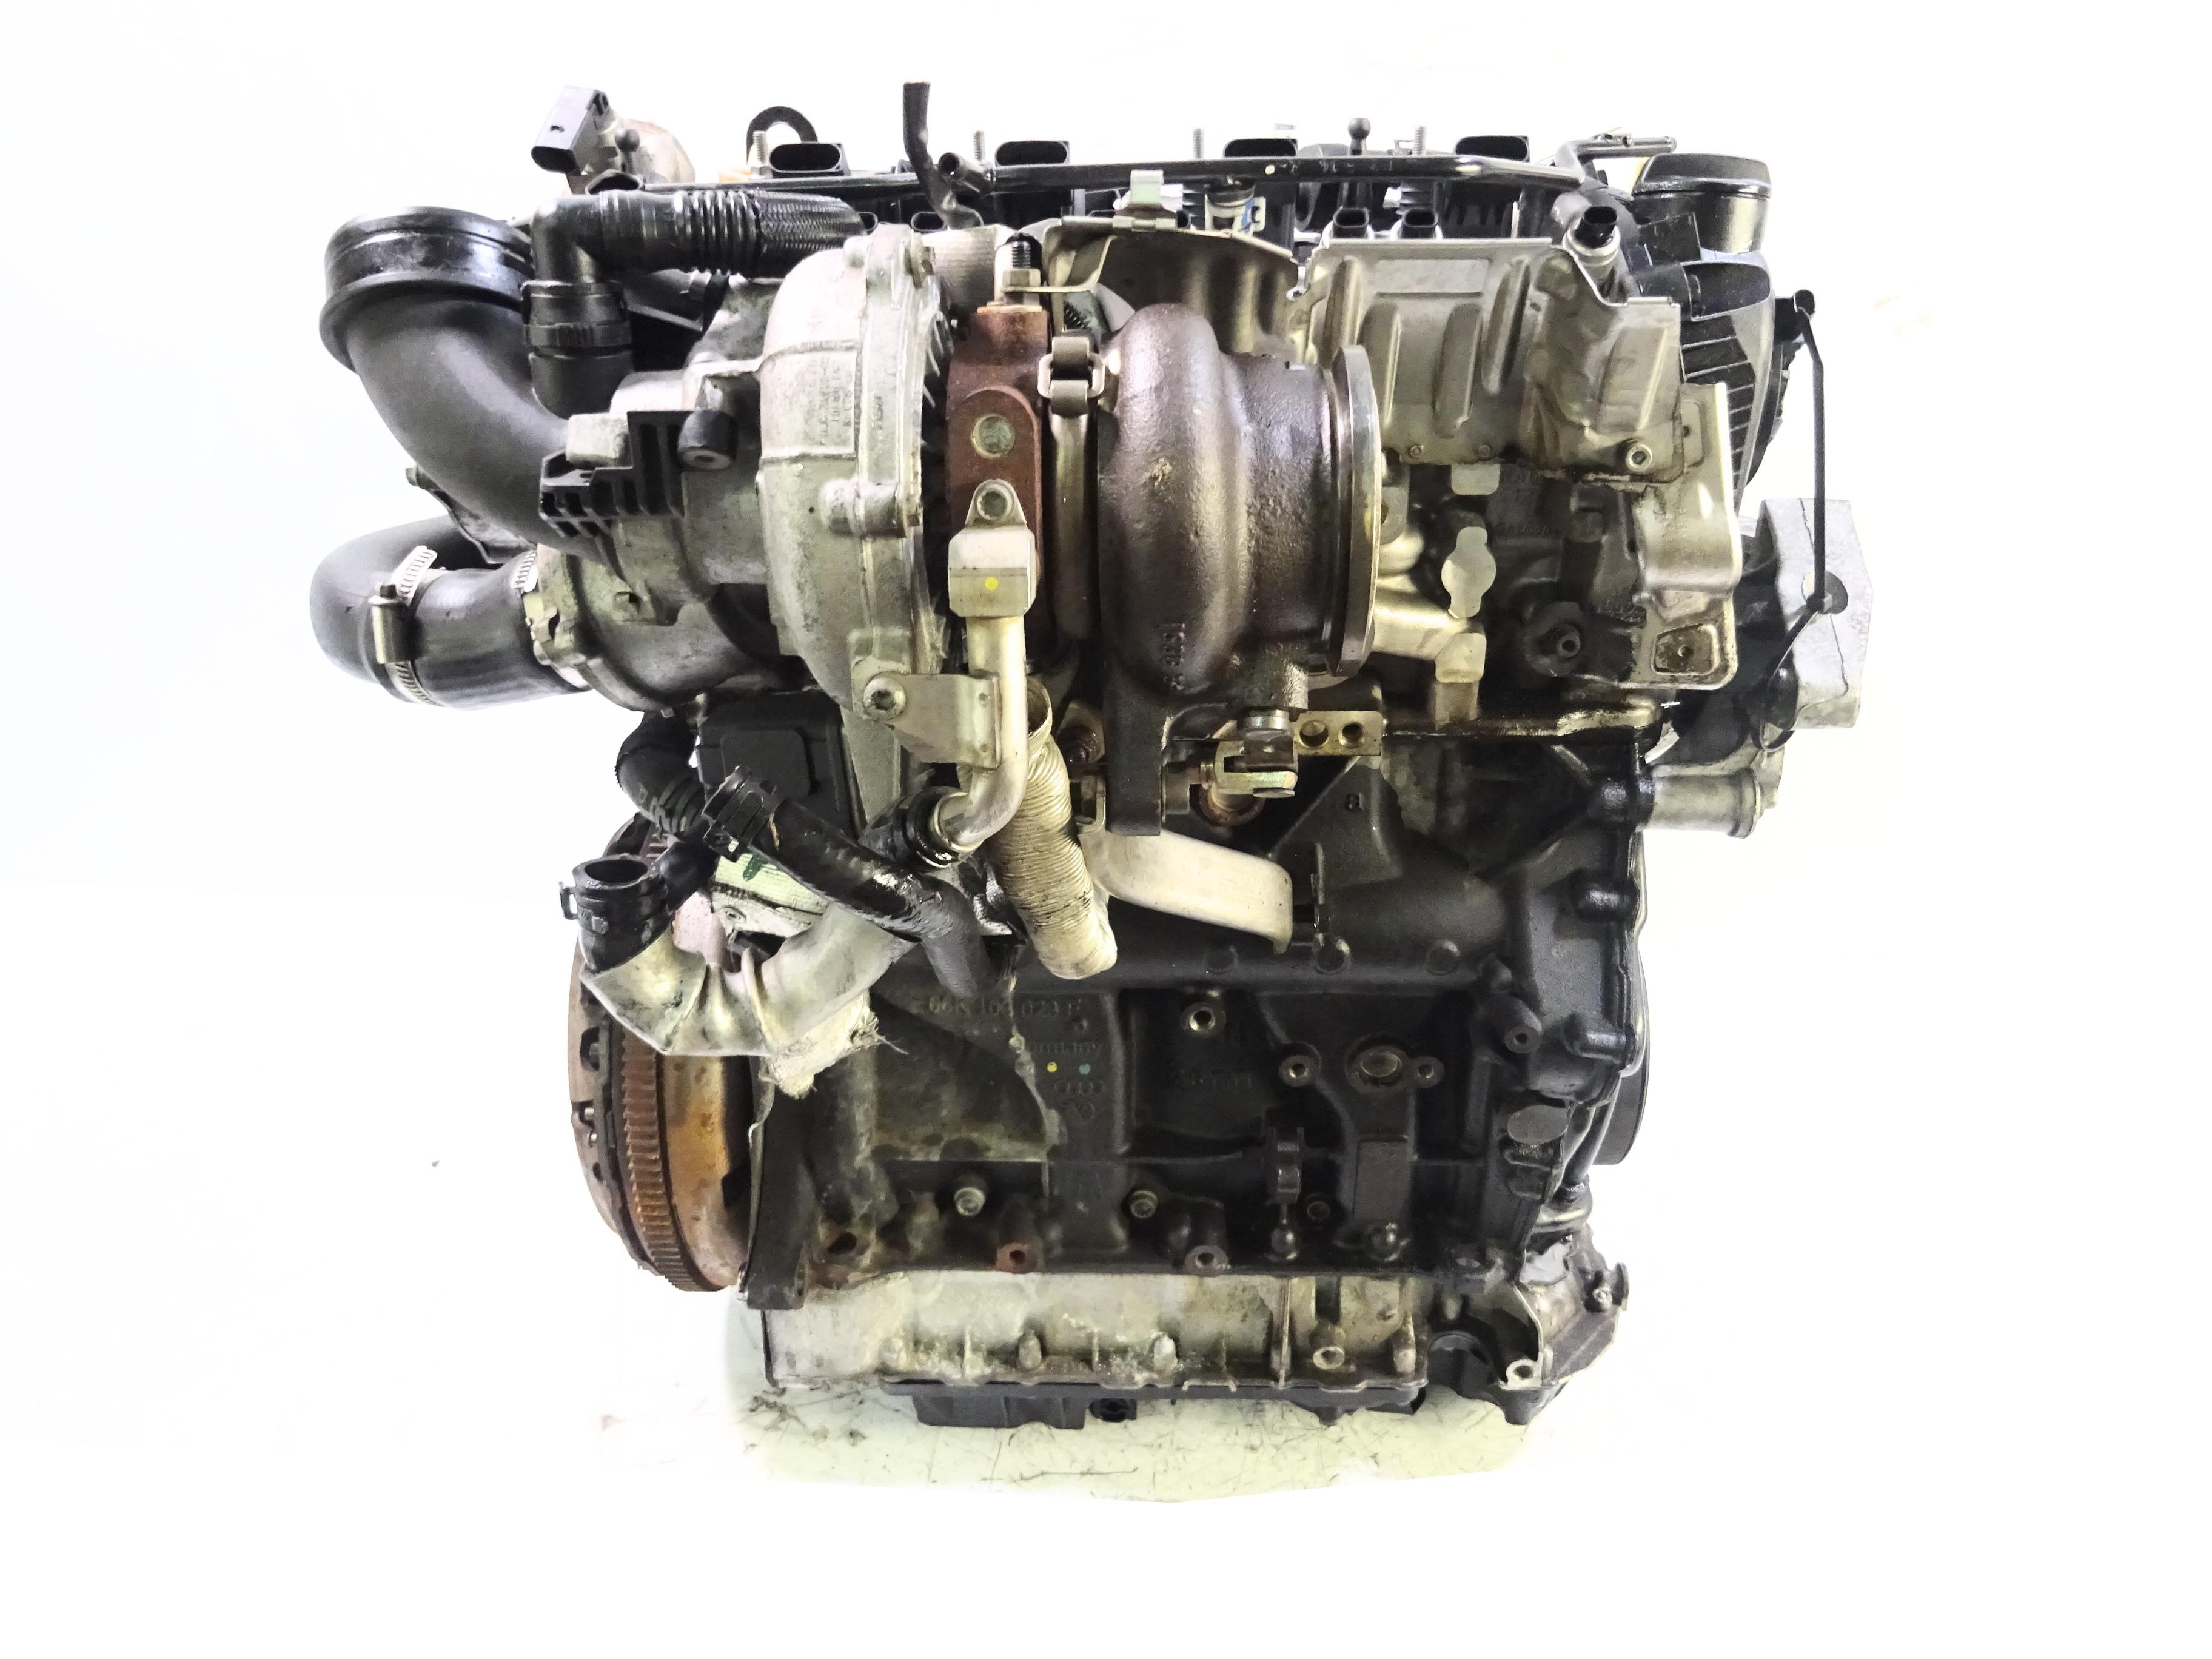 Motor für Audi A3 S3 8V 2,0 TFSI CJX CJXB CJXF